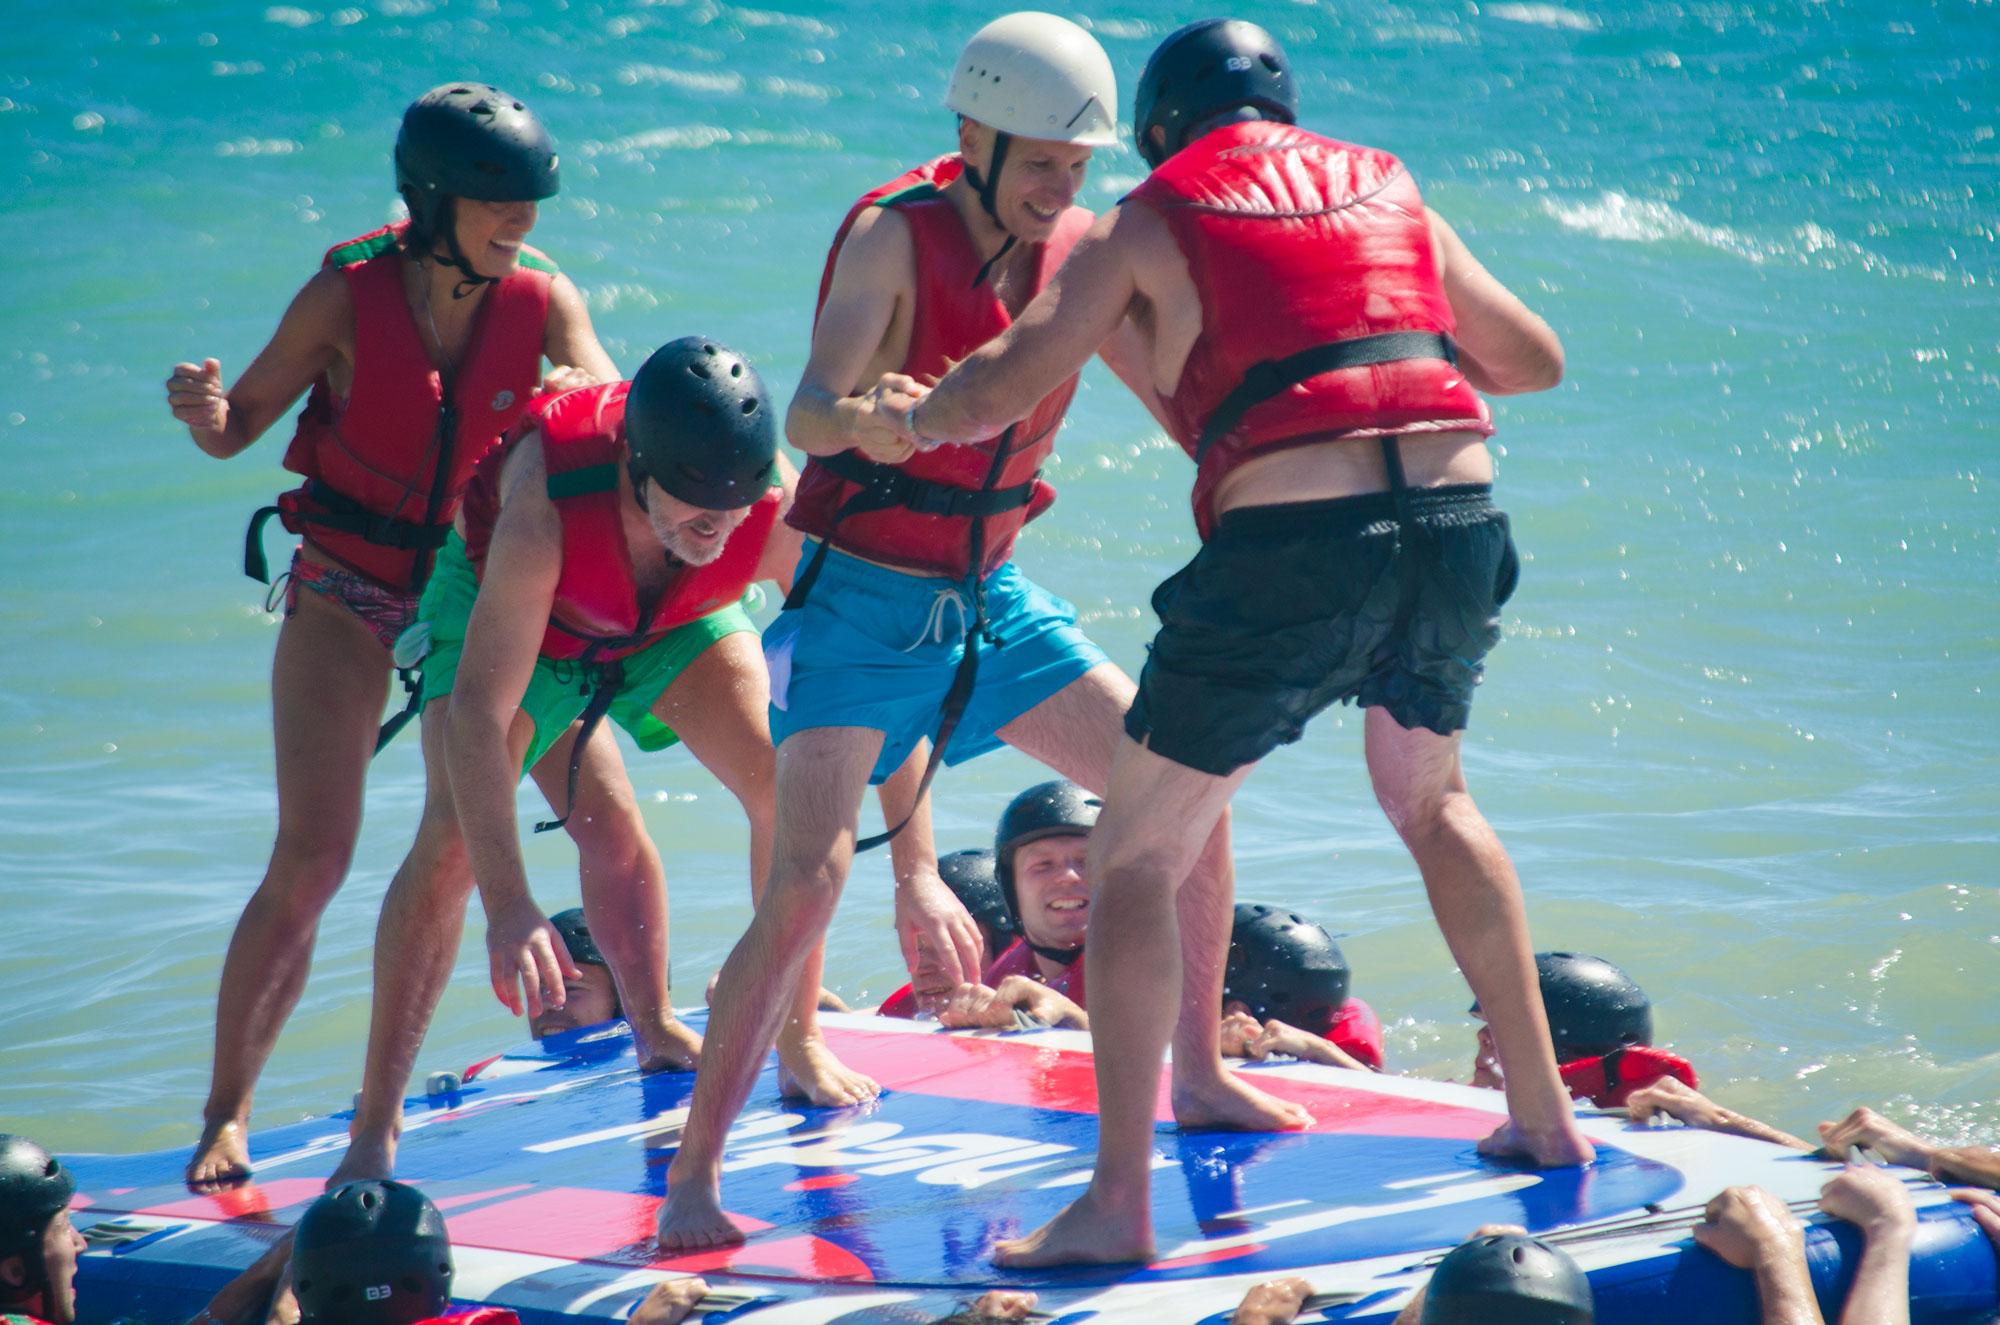 momentos-mediterranean-challenge-big-paddle-surf-6-marbella